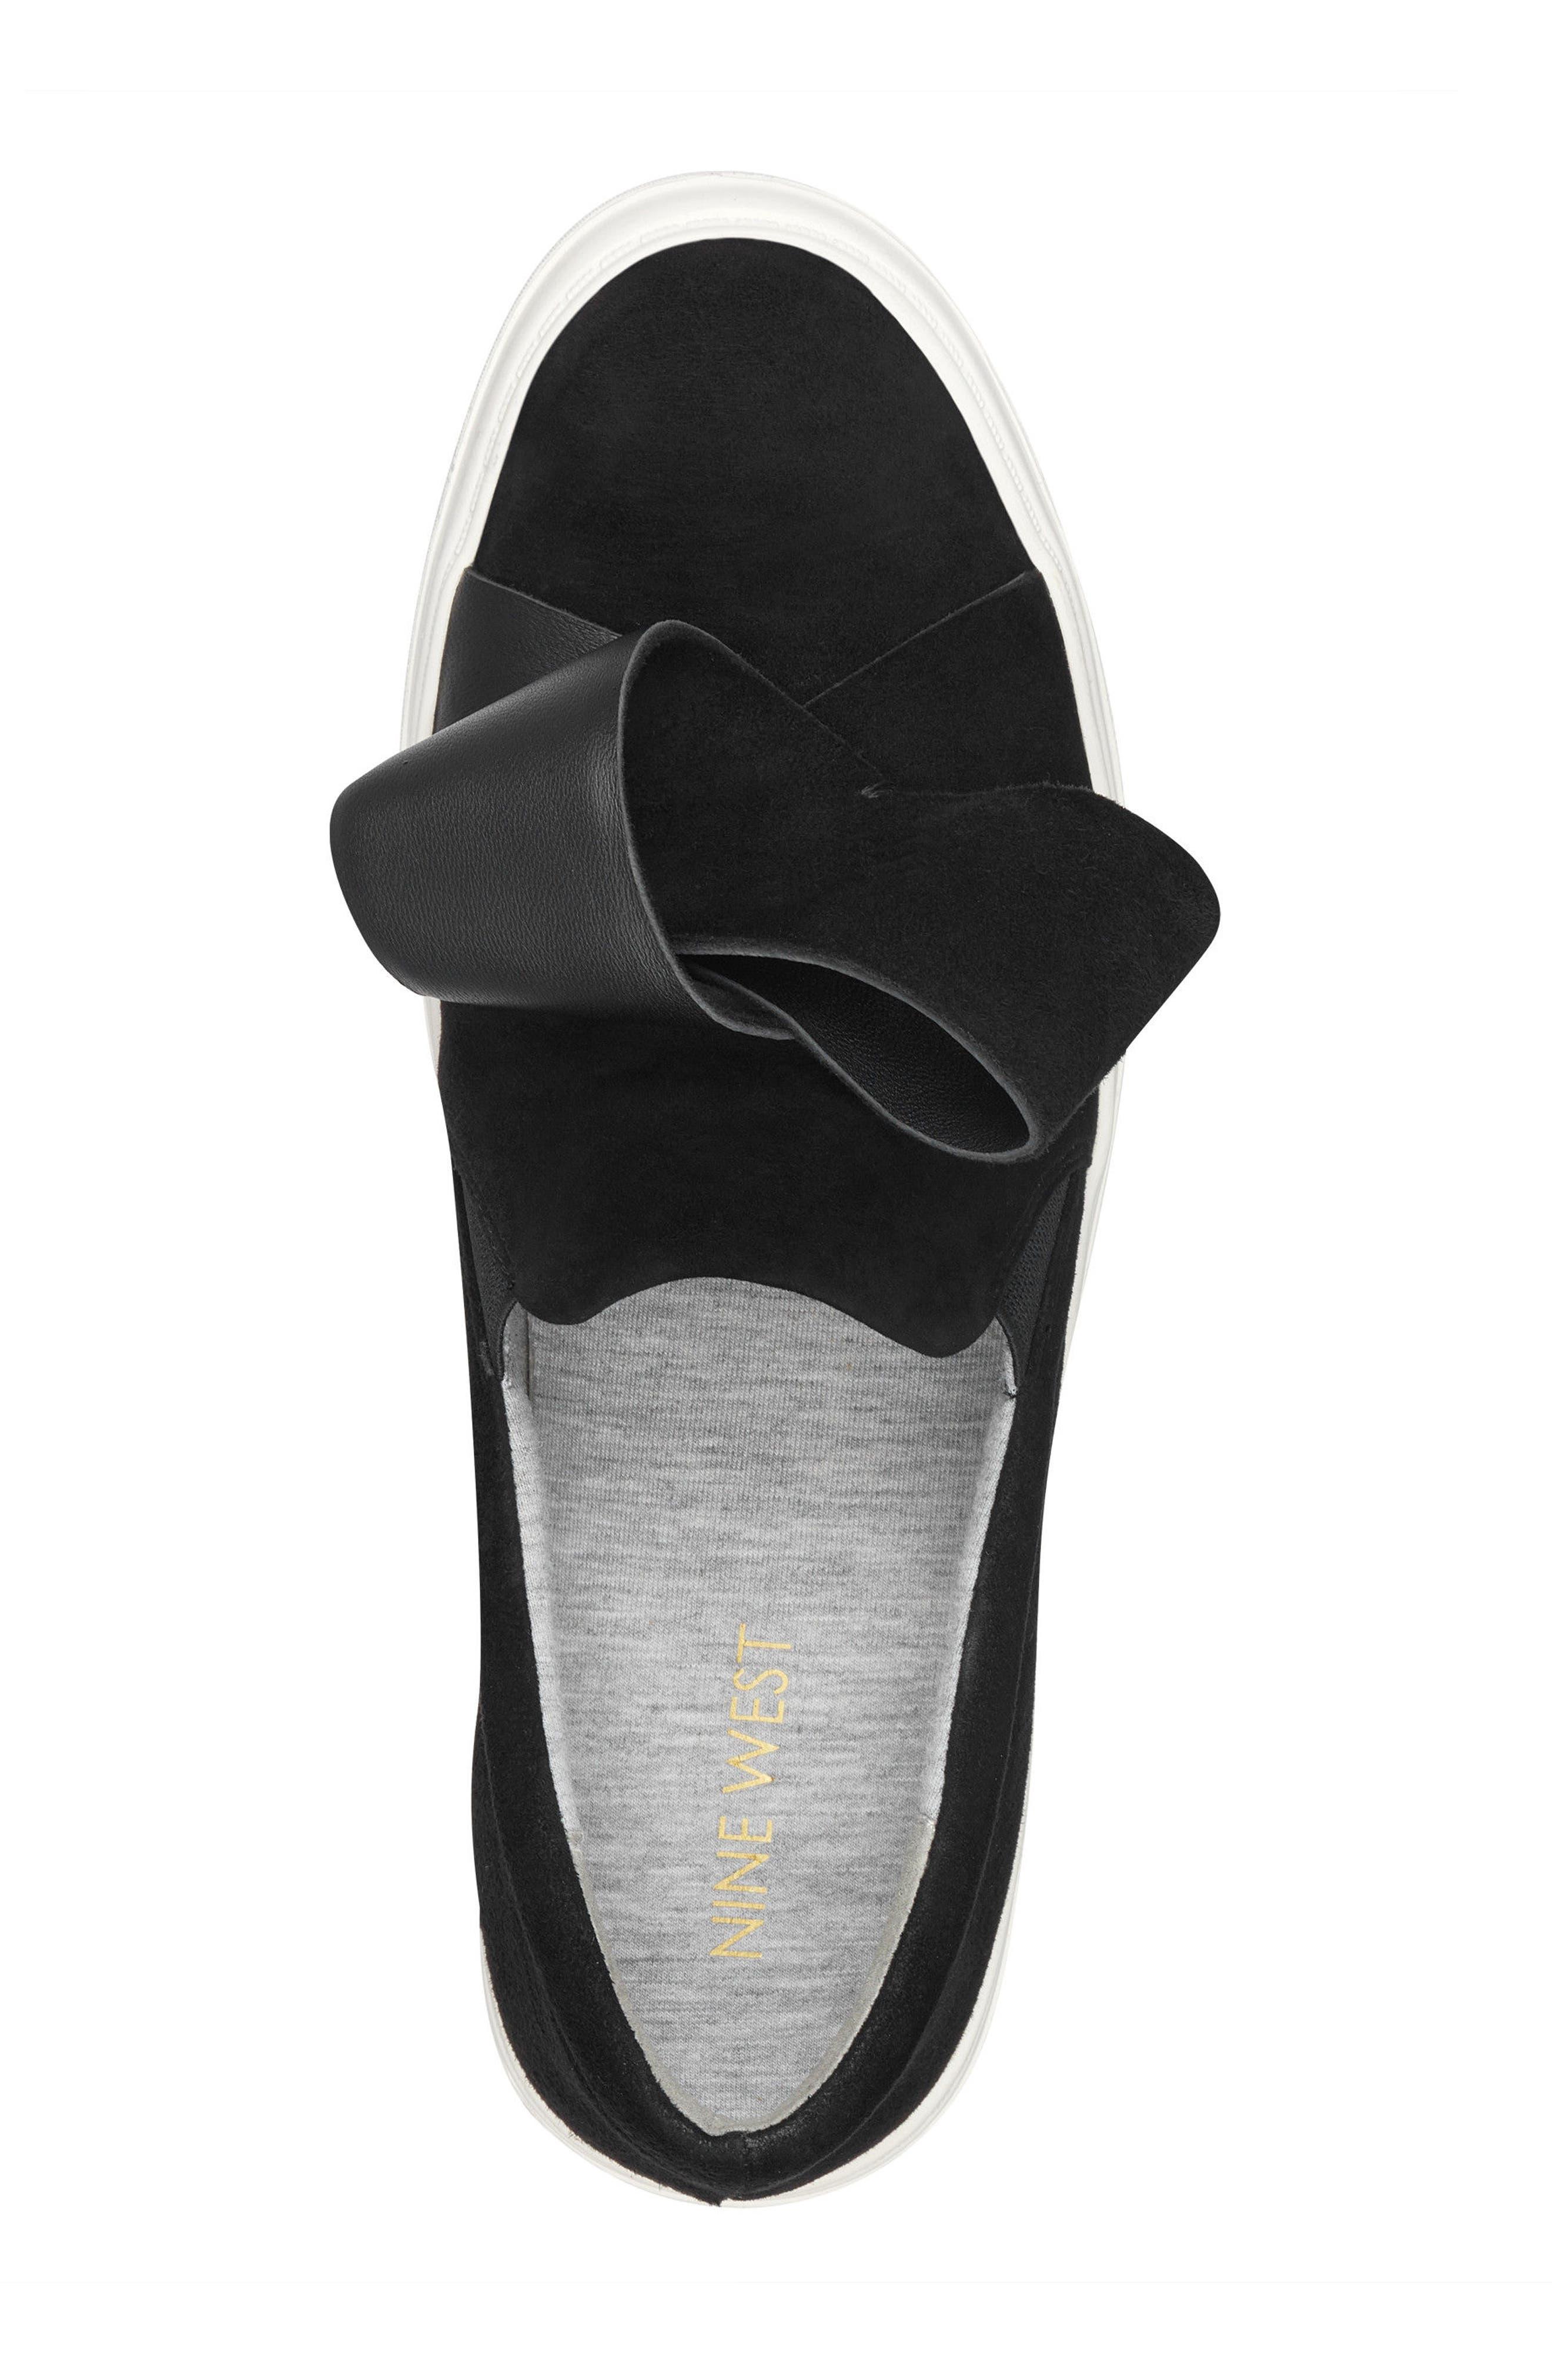 Odienella Slip-On Sneaker,                             Alternate thumbnail 5, color,                             BLACK MULTI SUEDE